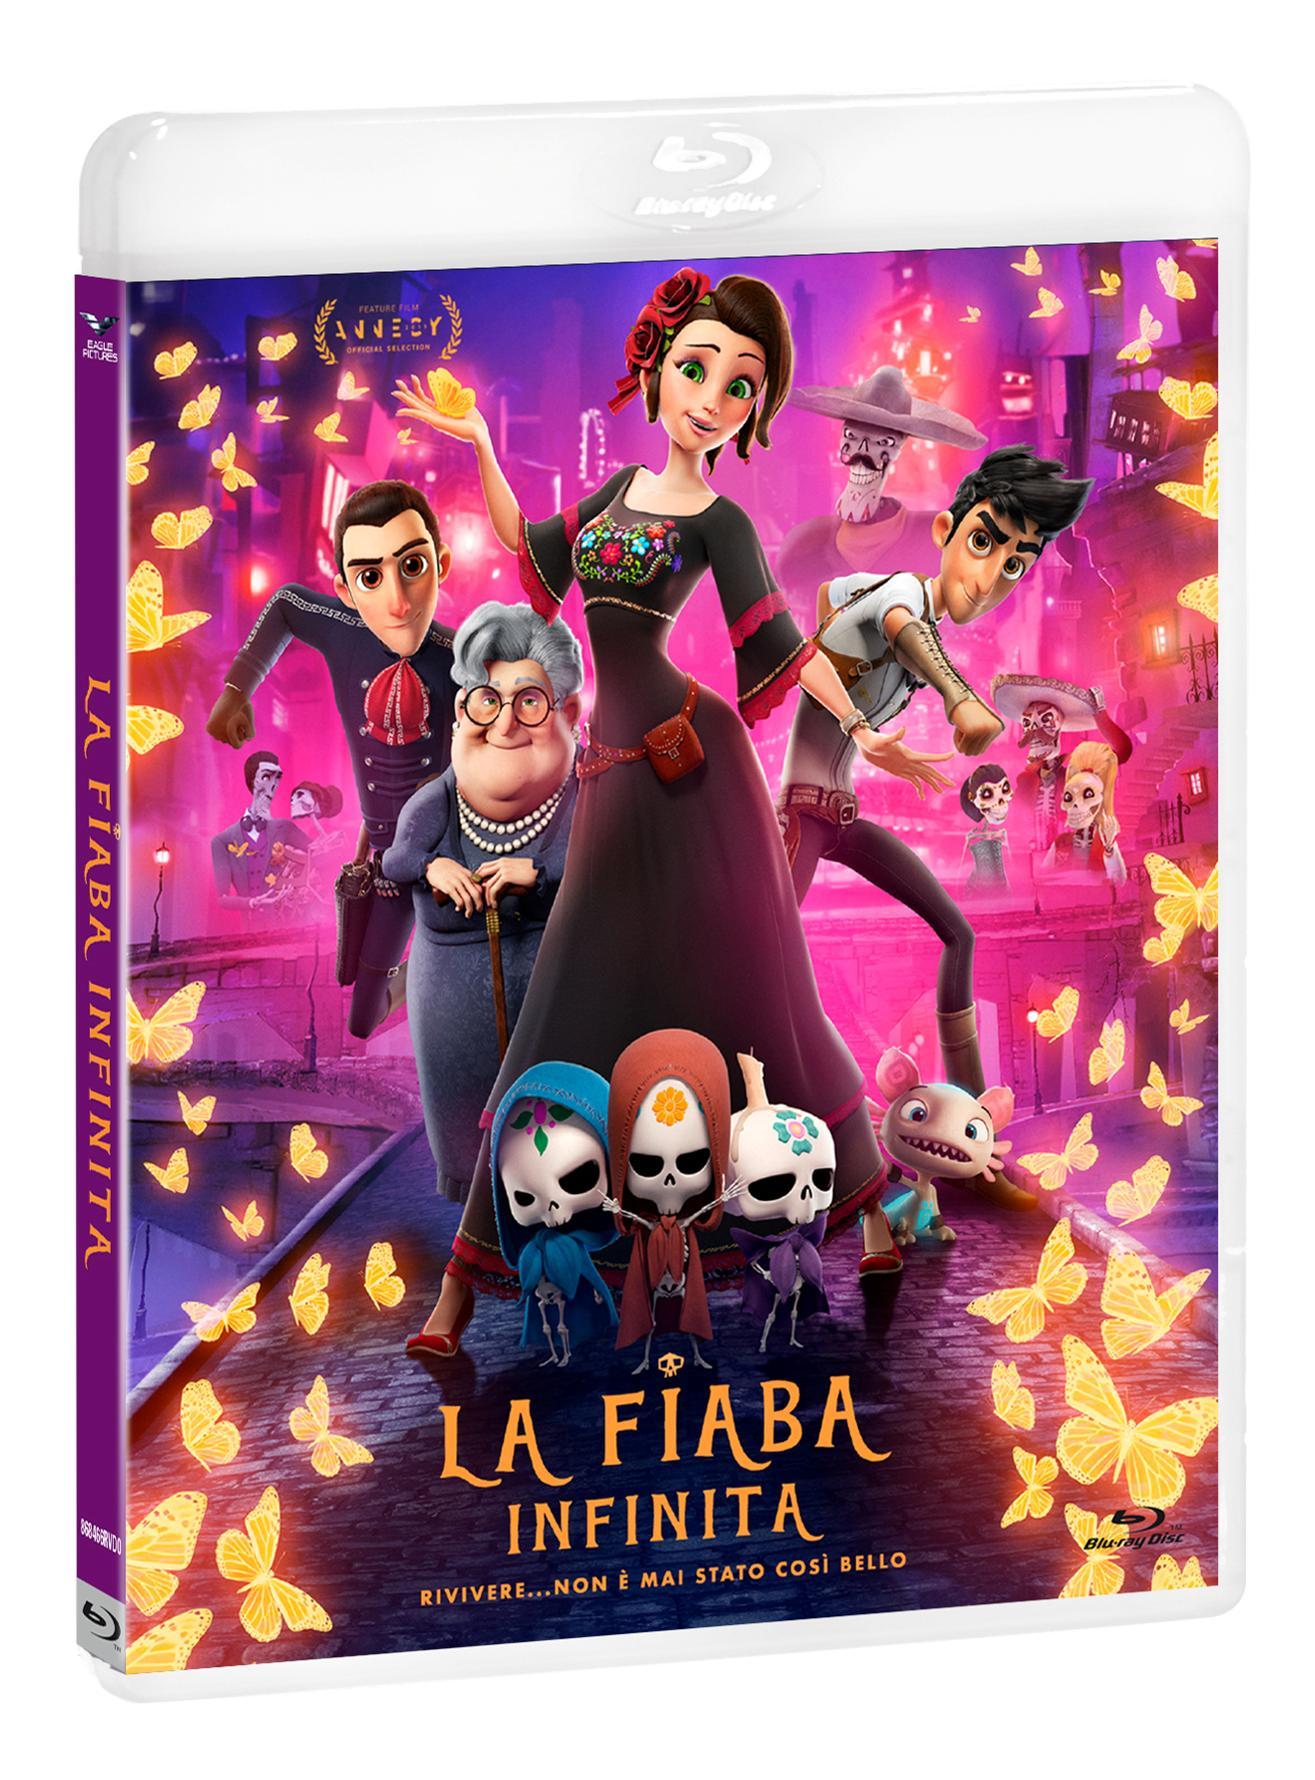 LA FIABA INFINITA - BLU RAY